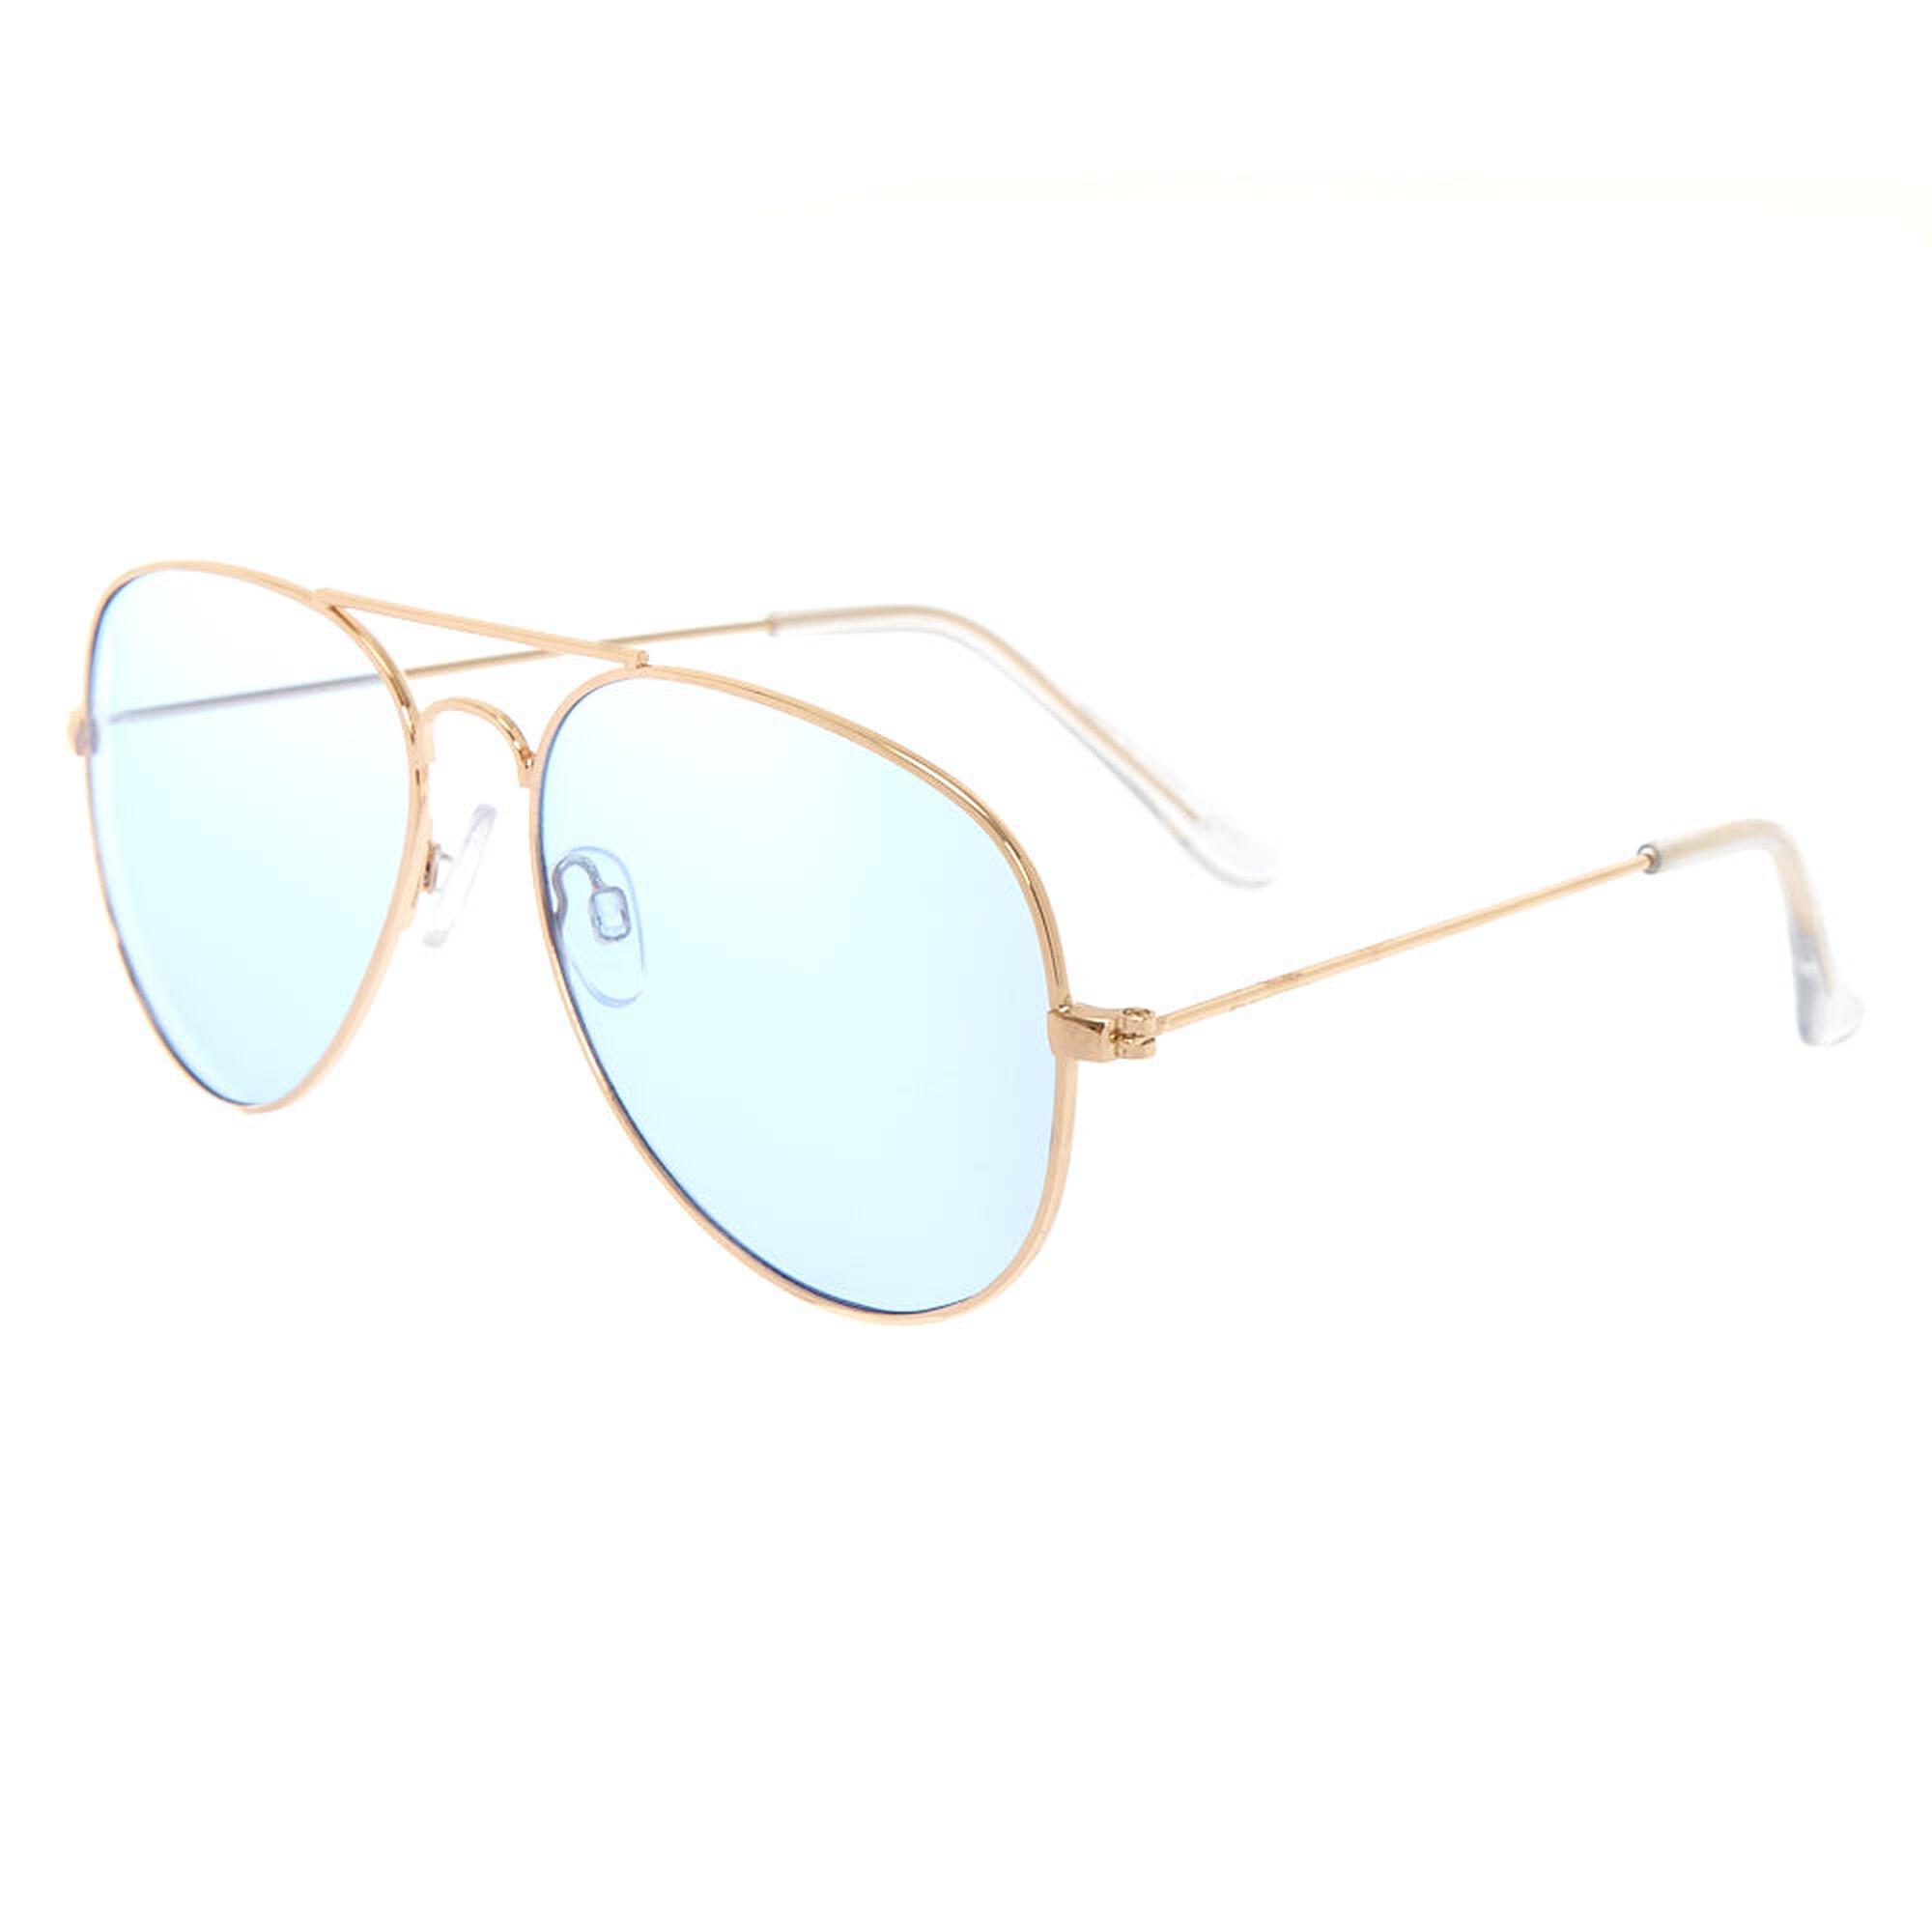 1a0ddb5cd7 Blue Tinted Gold Tone Aviator Sunglasses